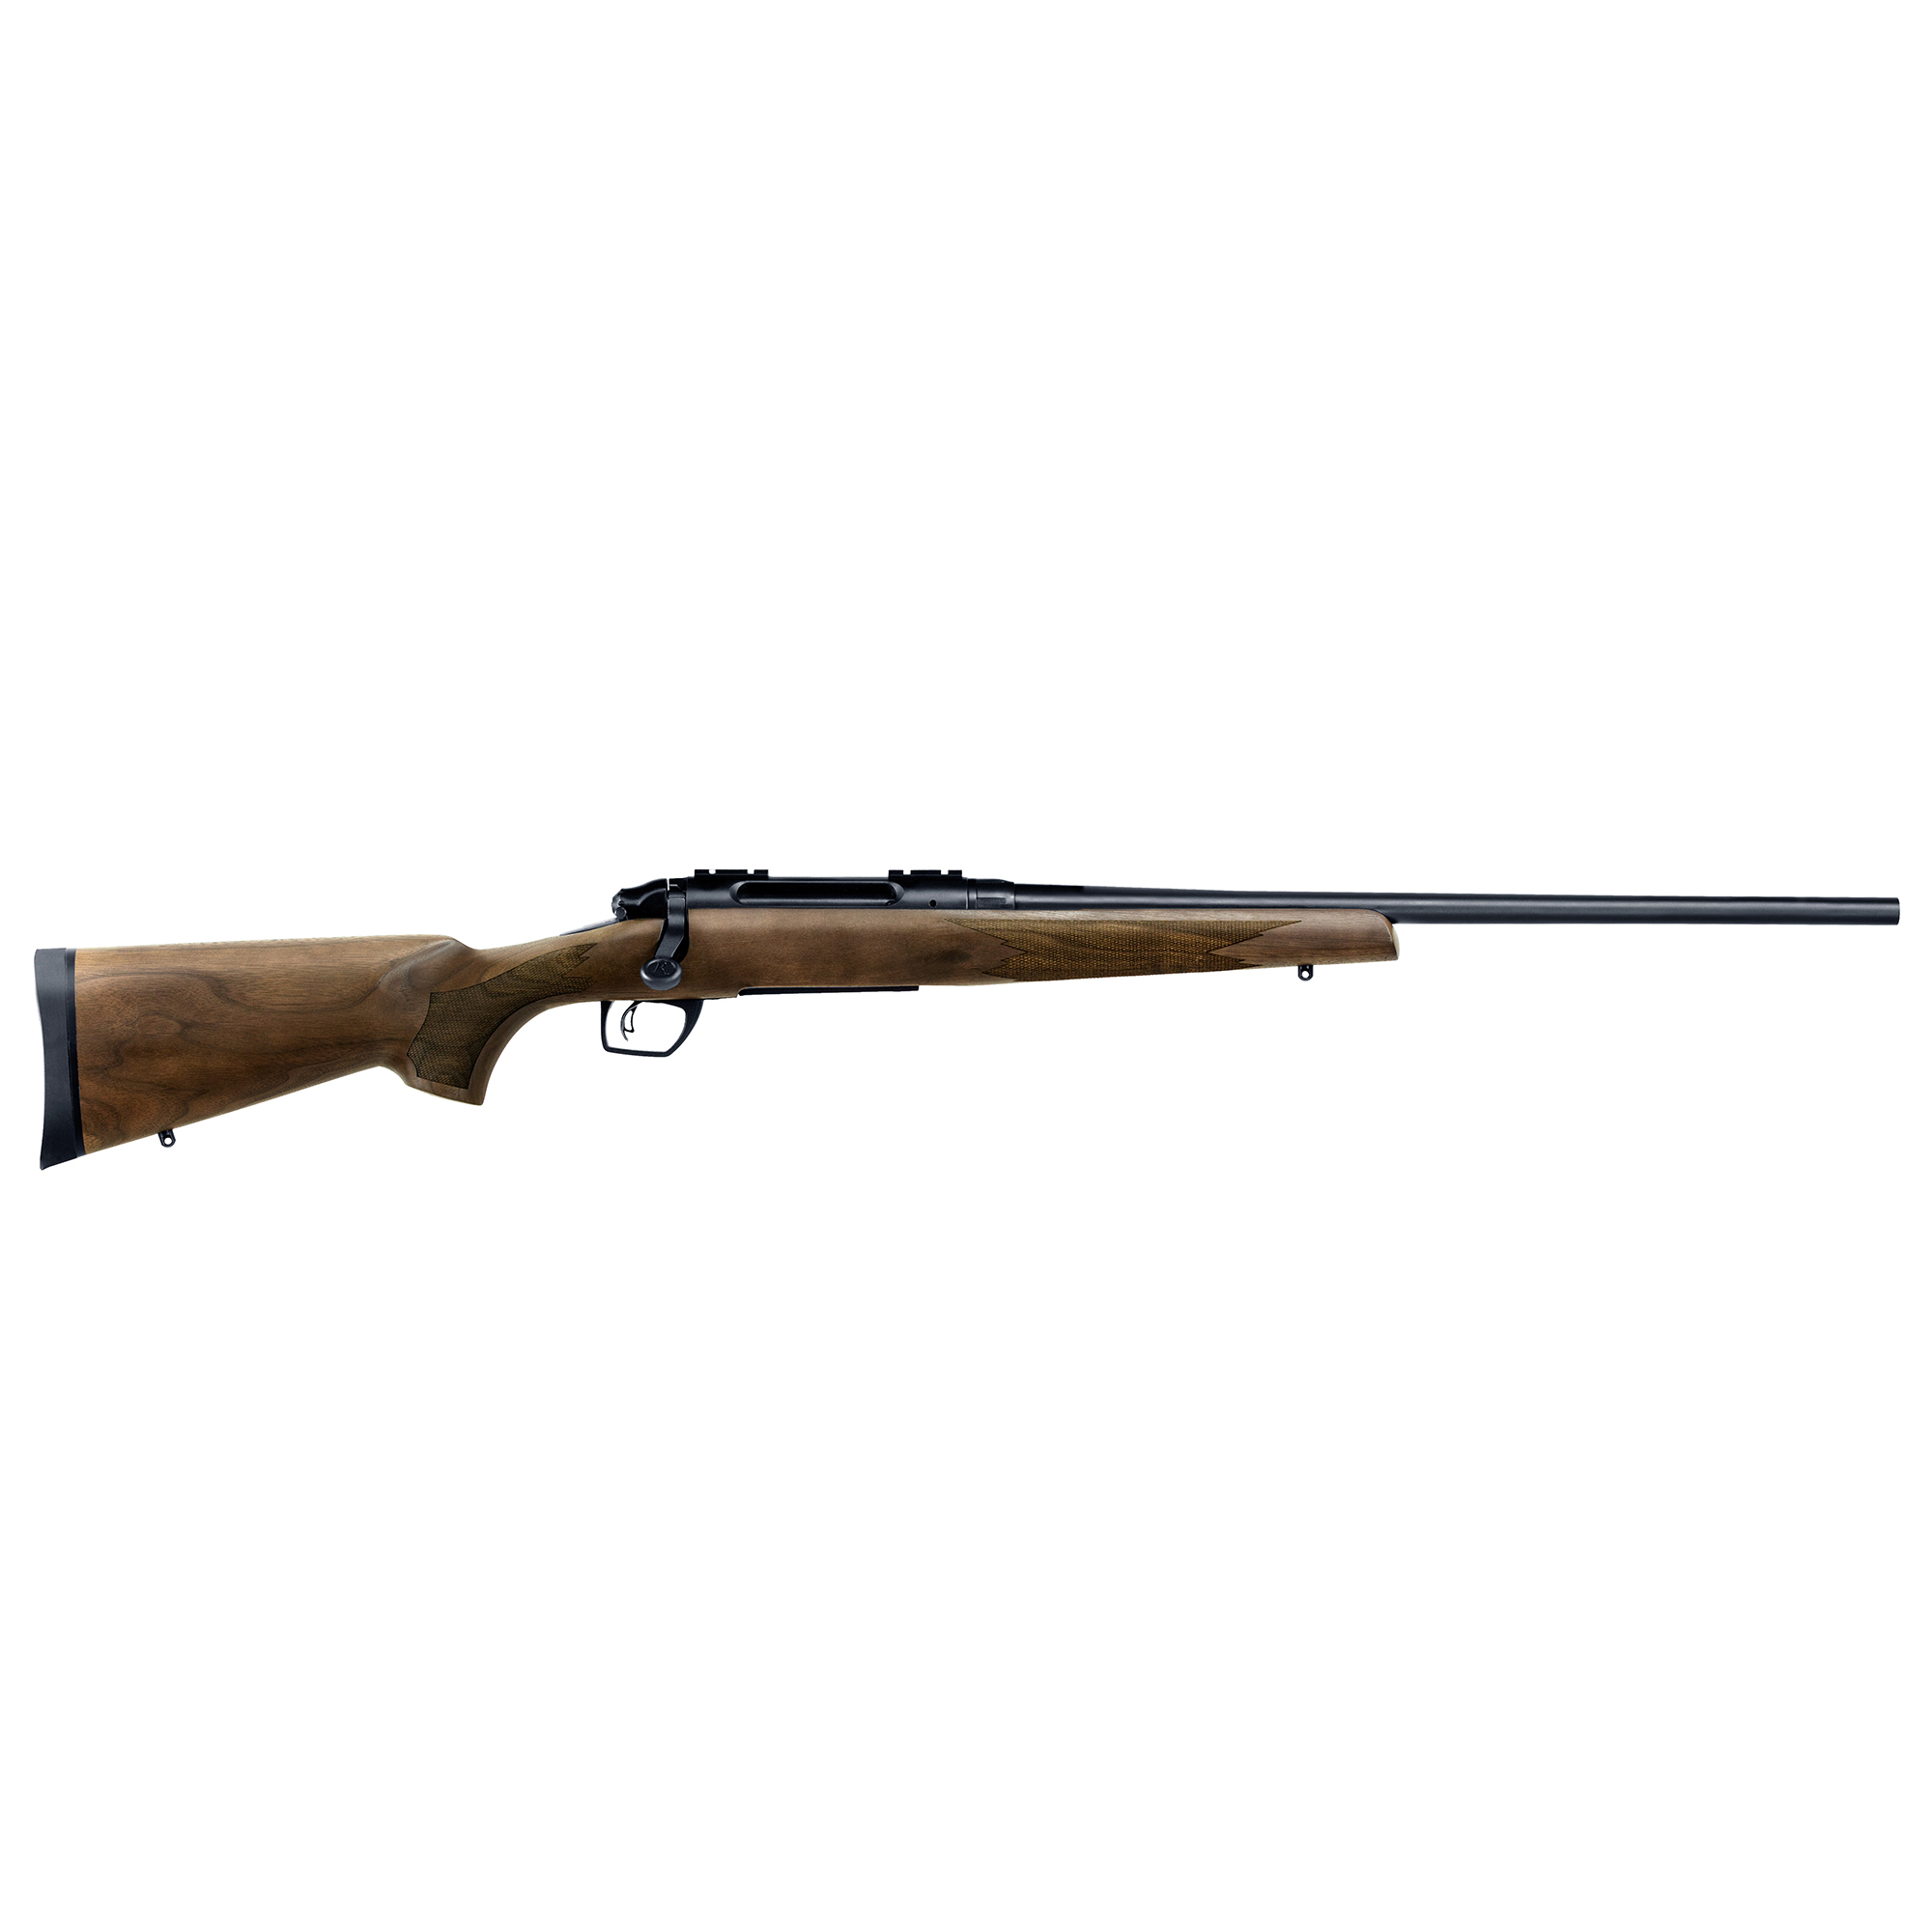 Remington Model 783 Walnut Centerfire Rifle, .308 Win.